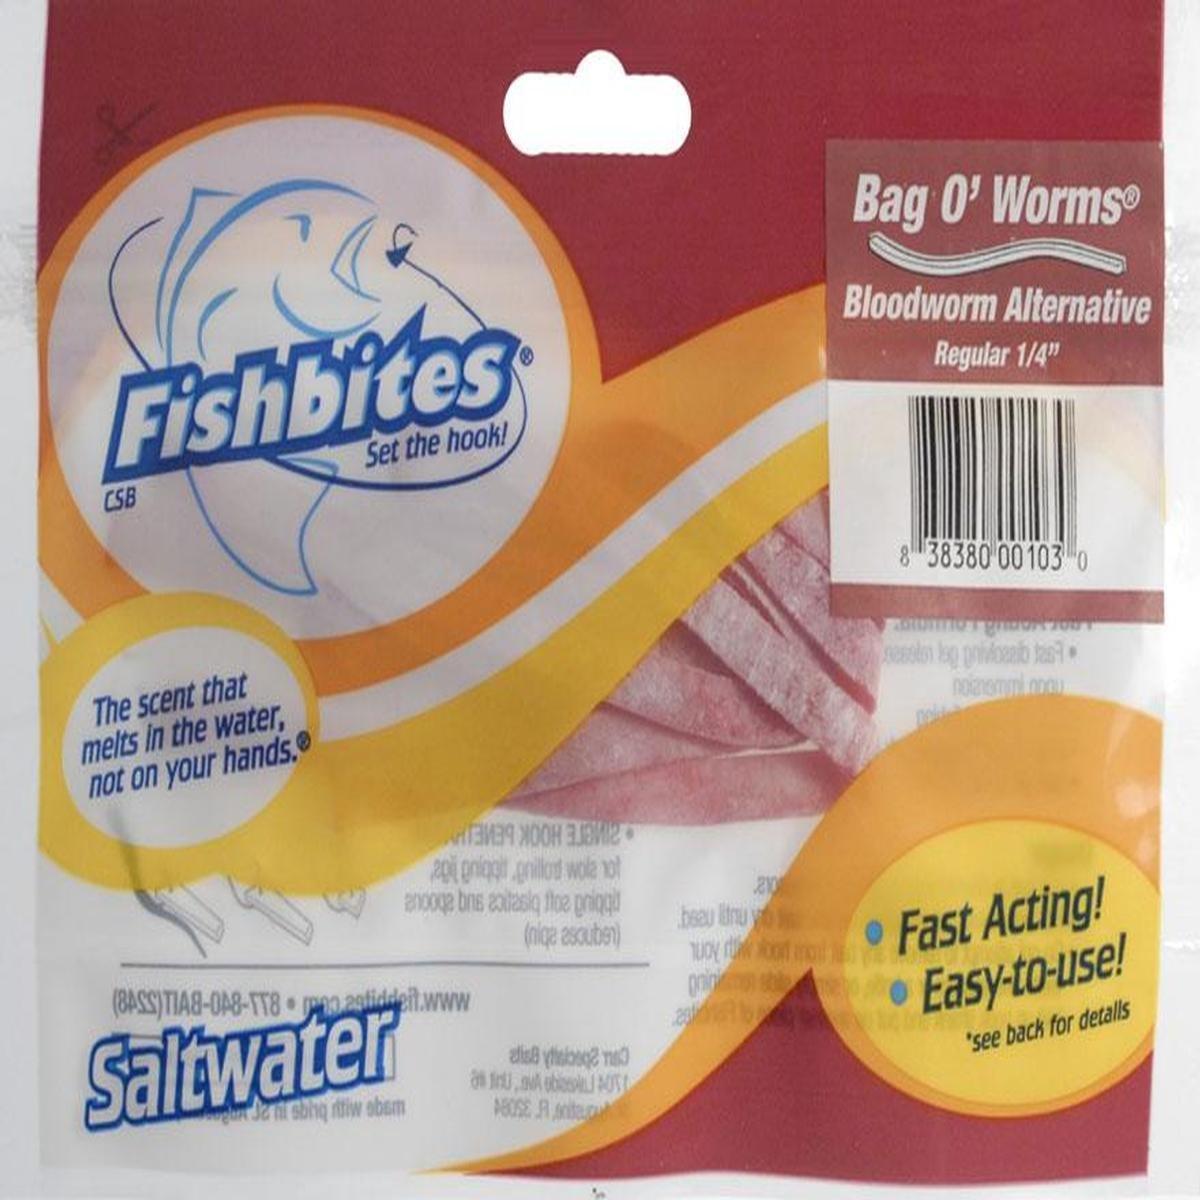 Fishbites Fishbites - Bloodworms 1/4 Fa - 103